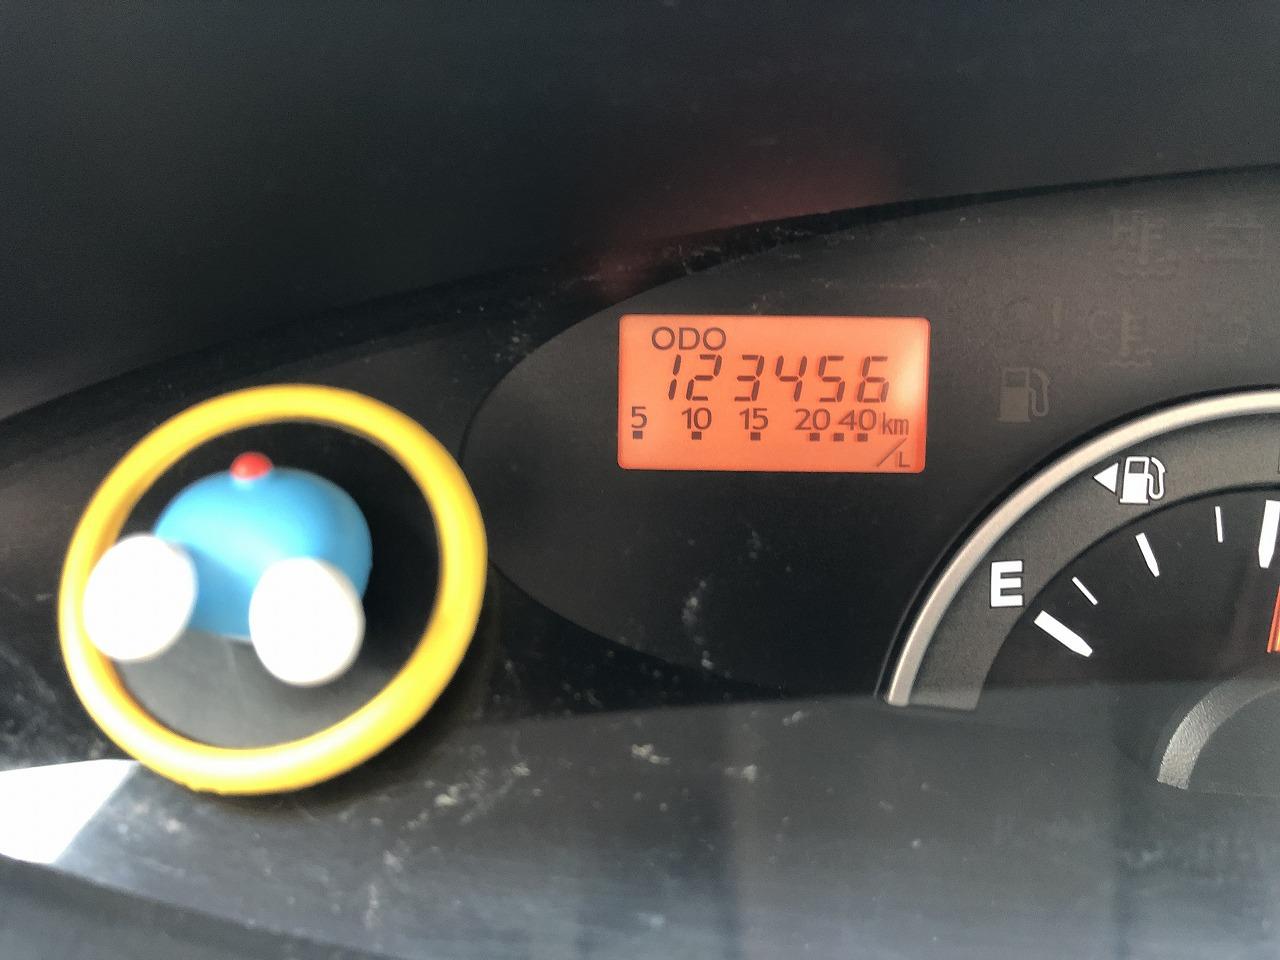 123456kmモーメント!